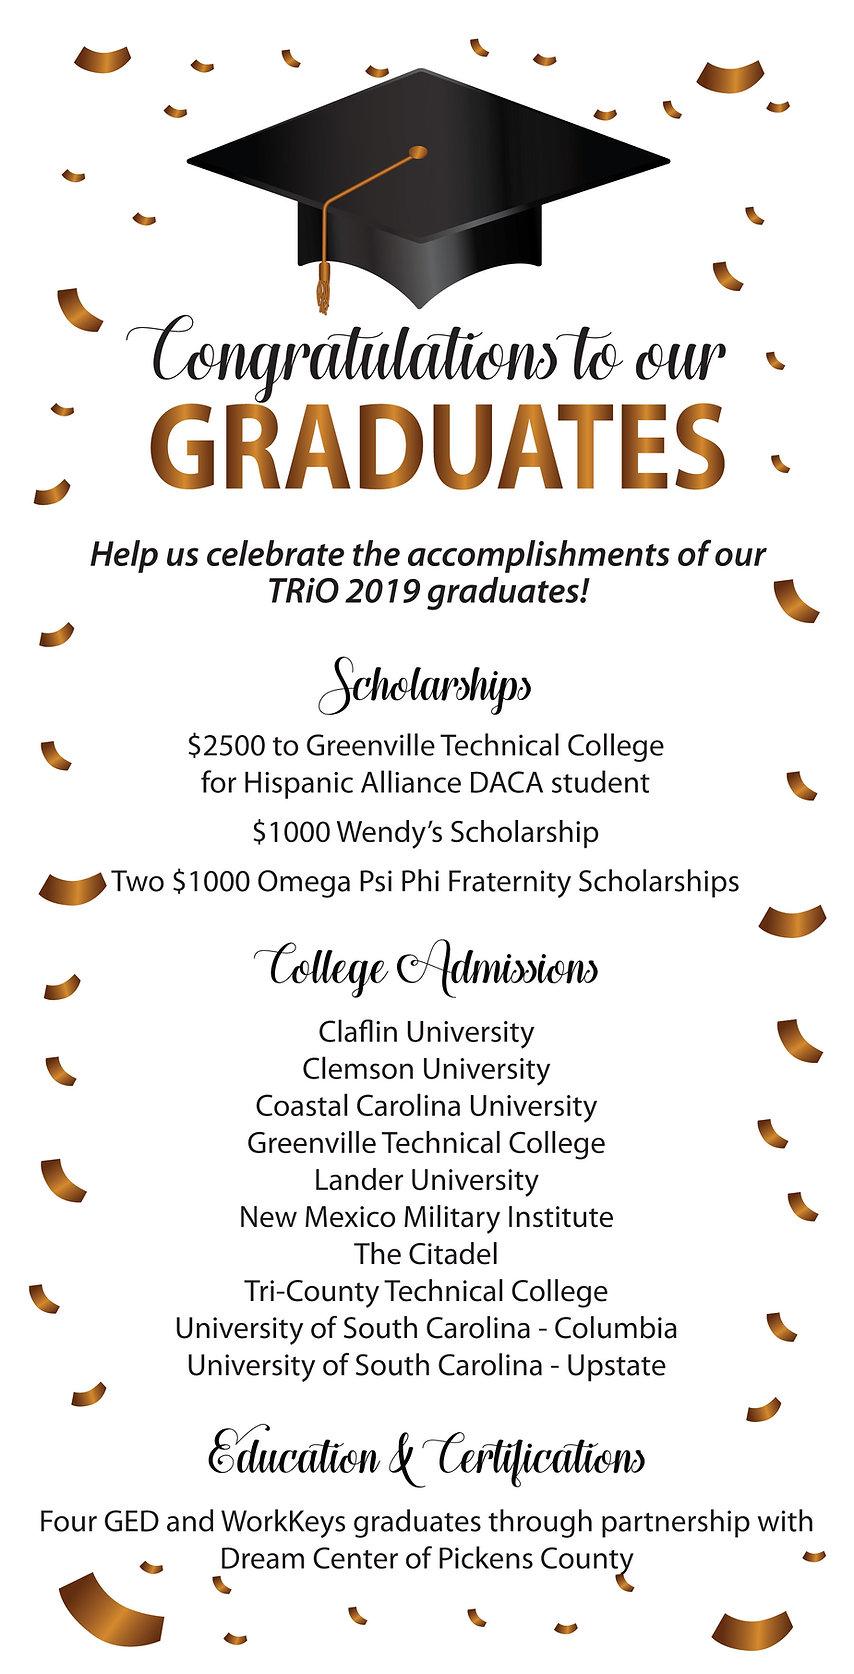 2019-Graduate-Accomplishments.jpg